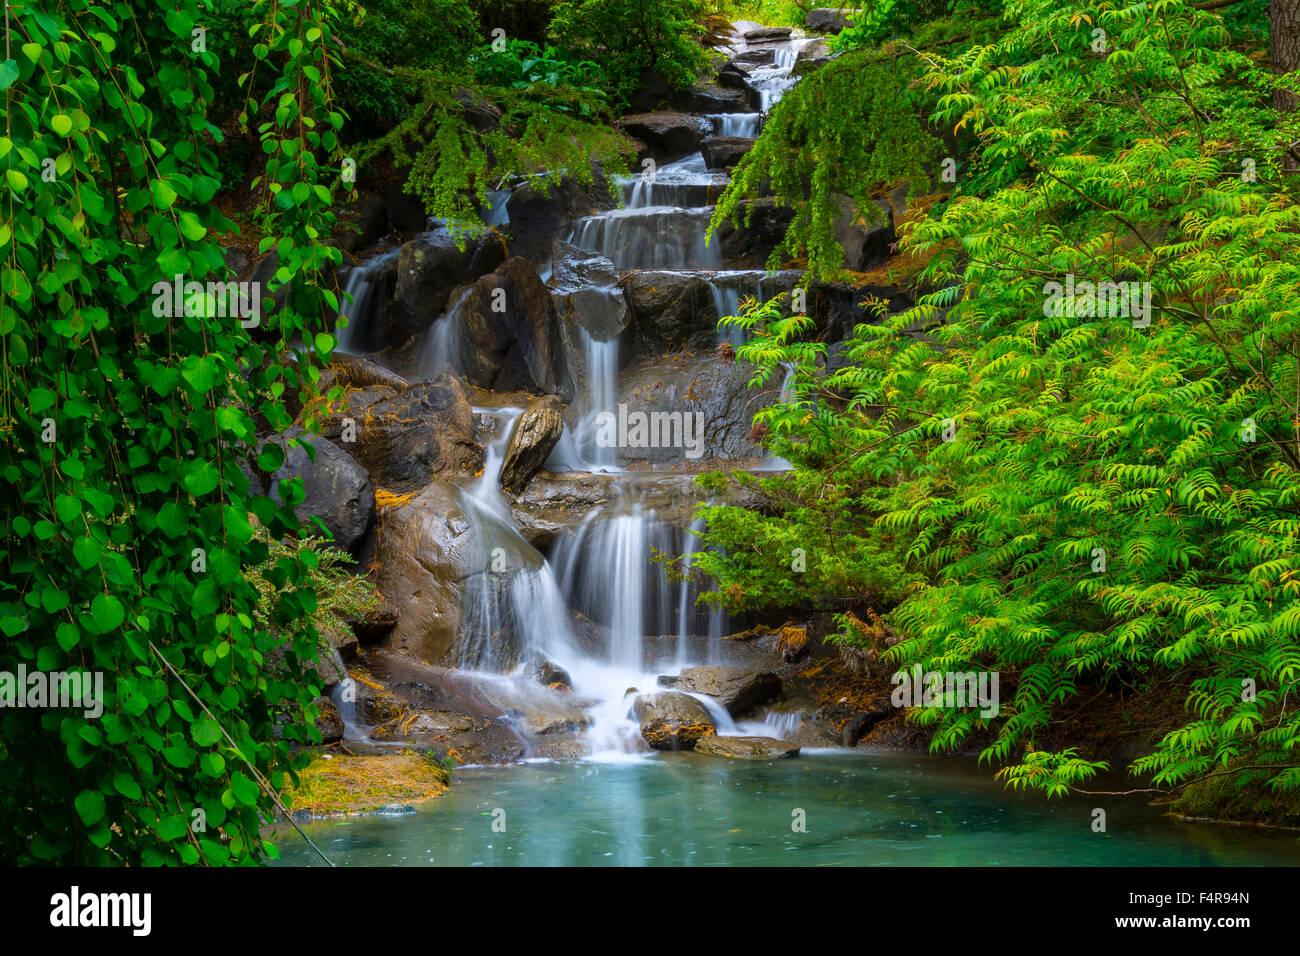 British Columbia, Canada, Vancouver VanDusen, Botanical Garden, Botanical,  Garden, Summer, Waterfall